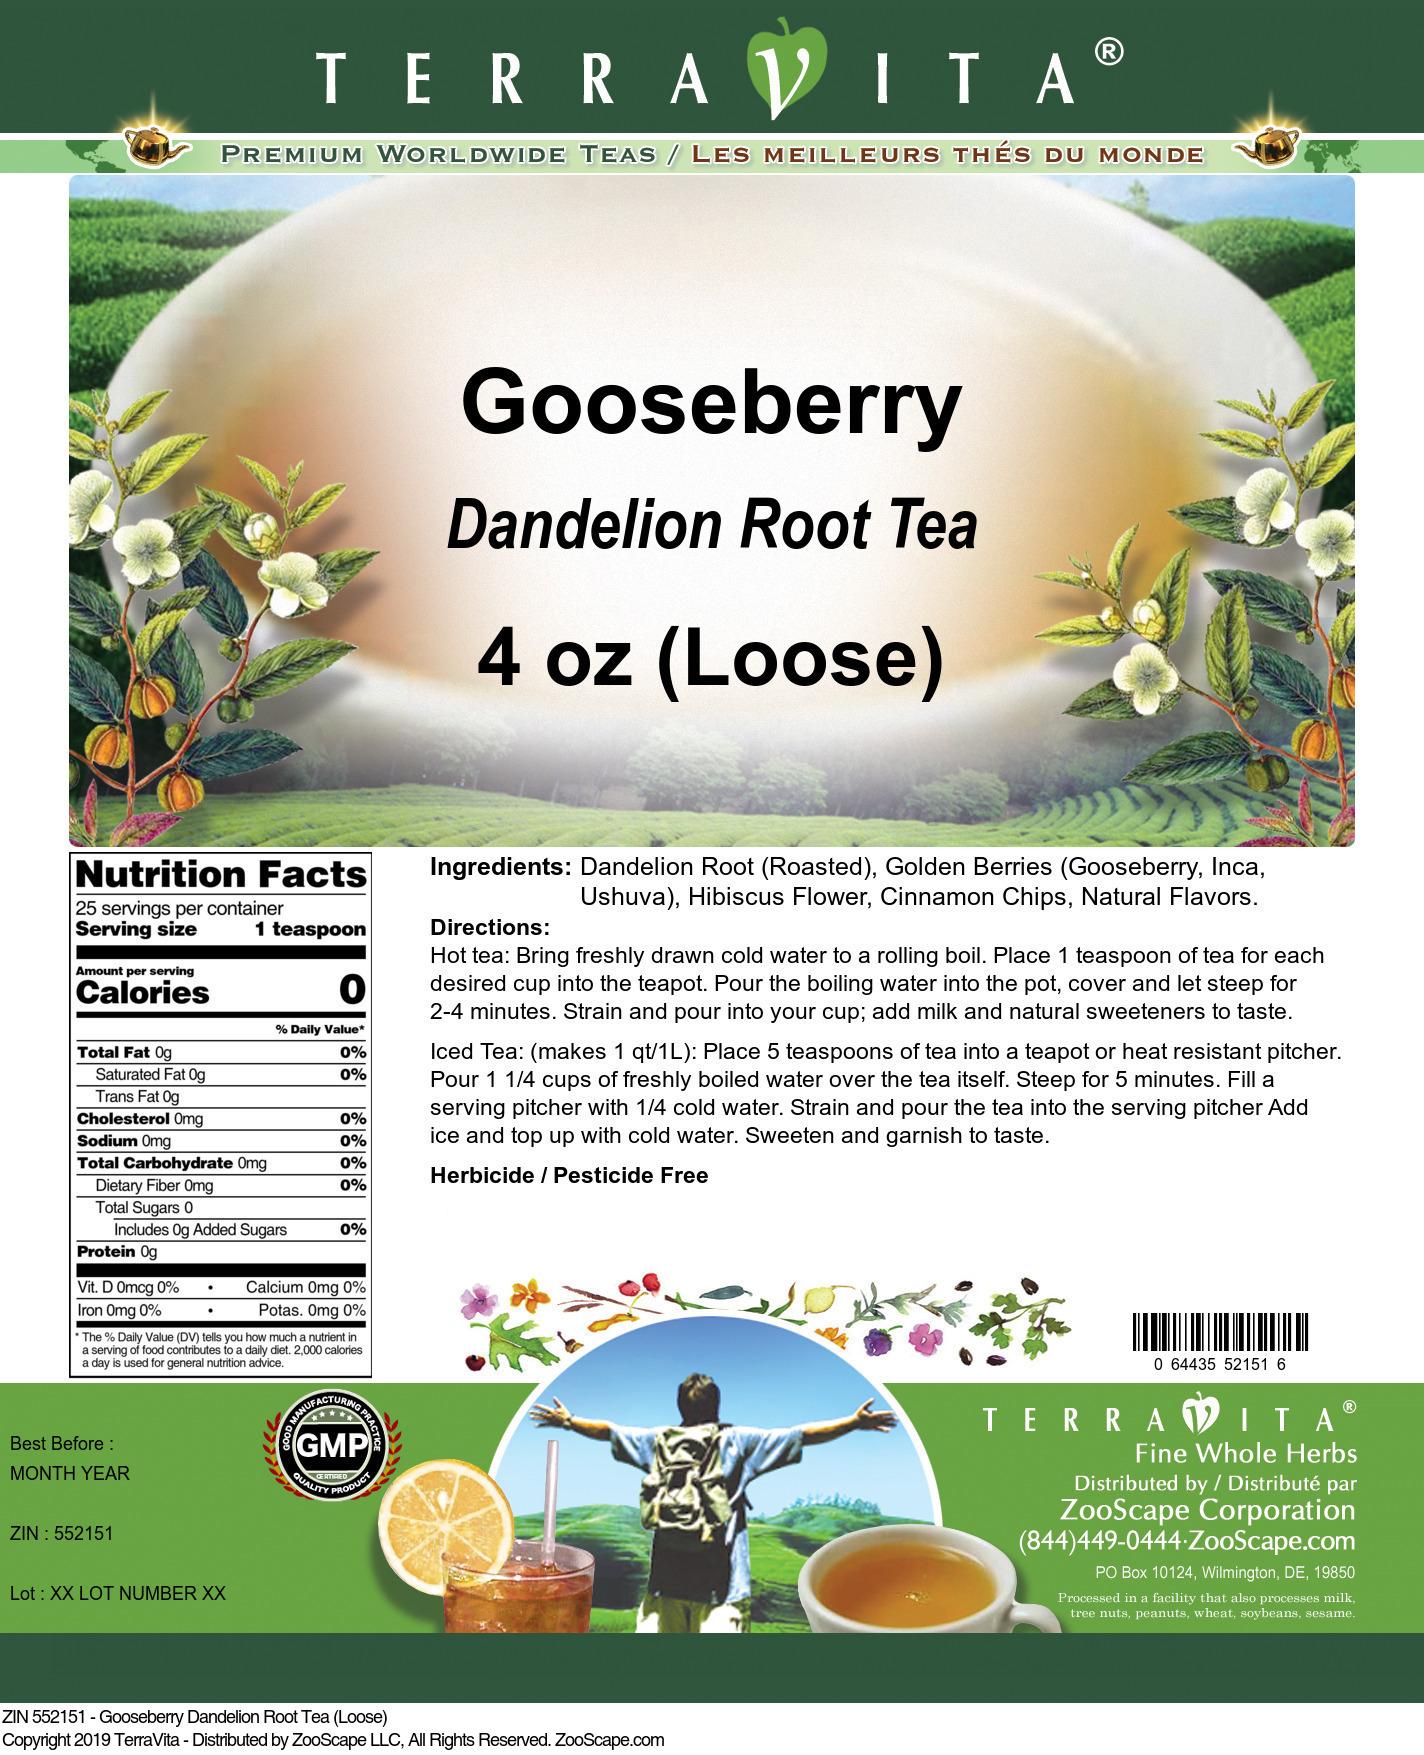 Gooseberry Dandelion Root Tea (Loose)